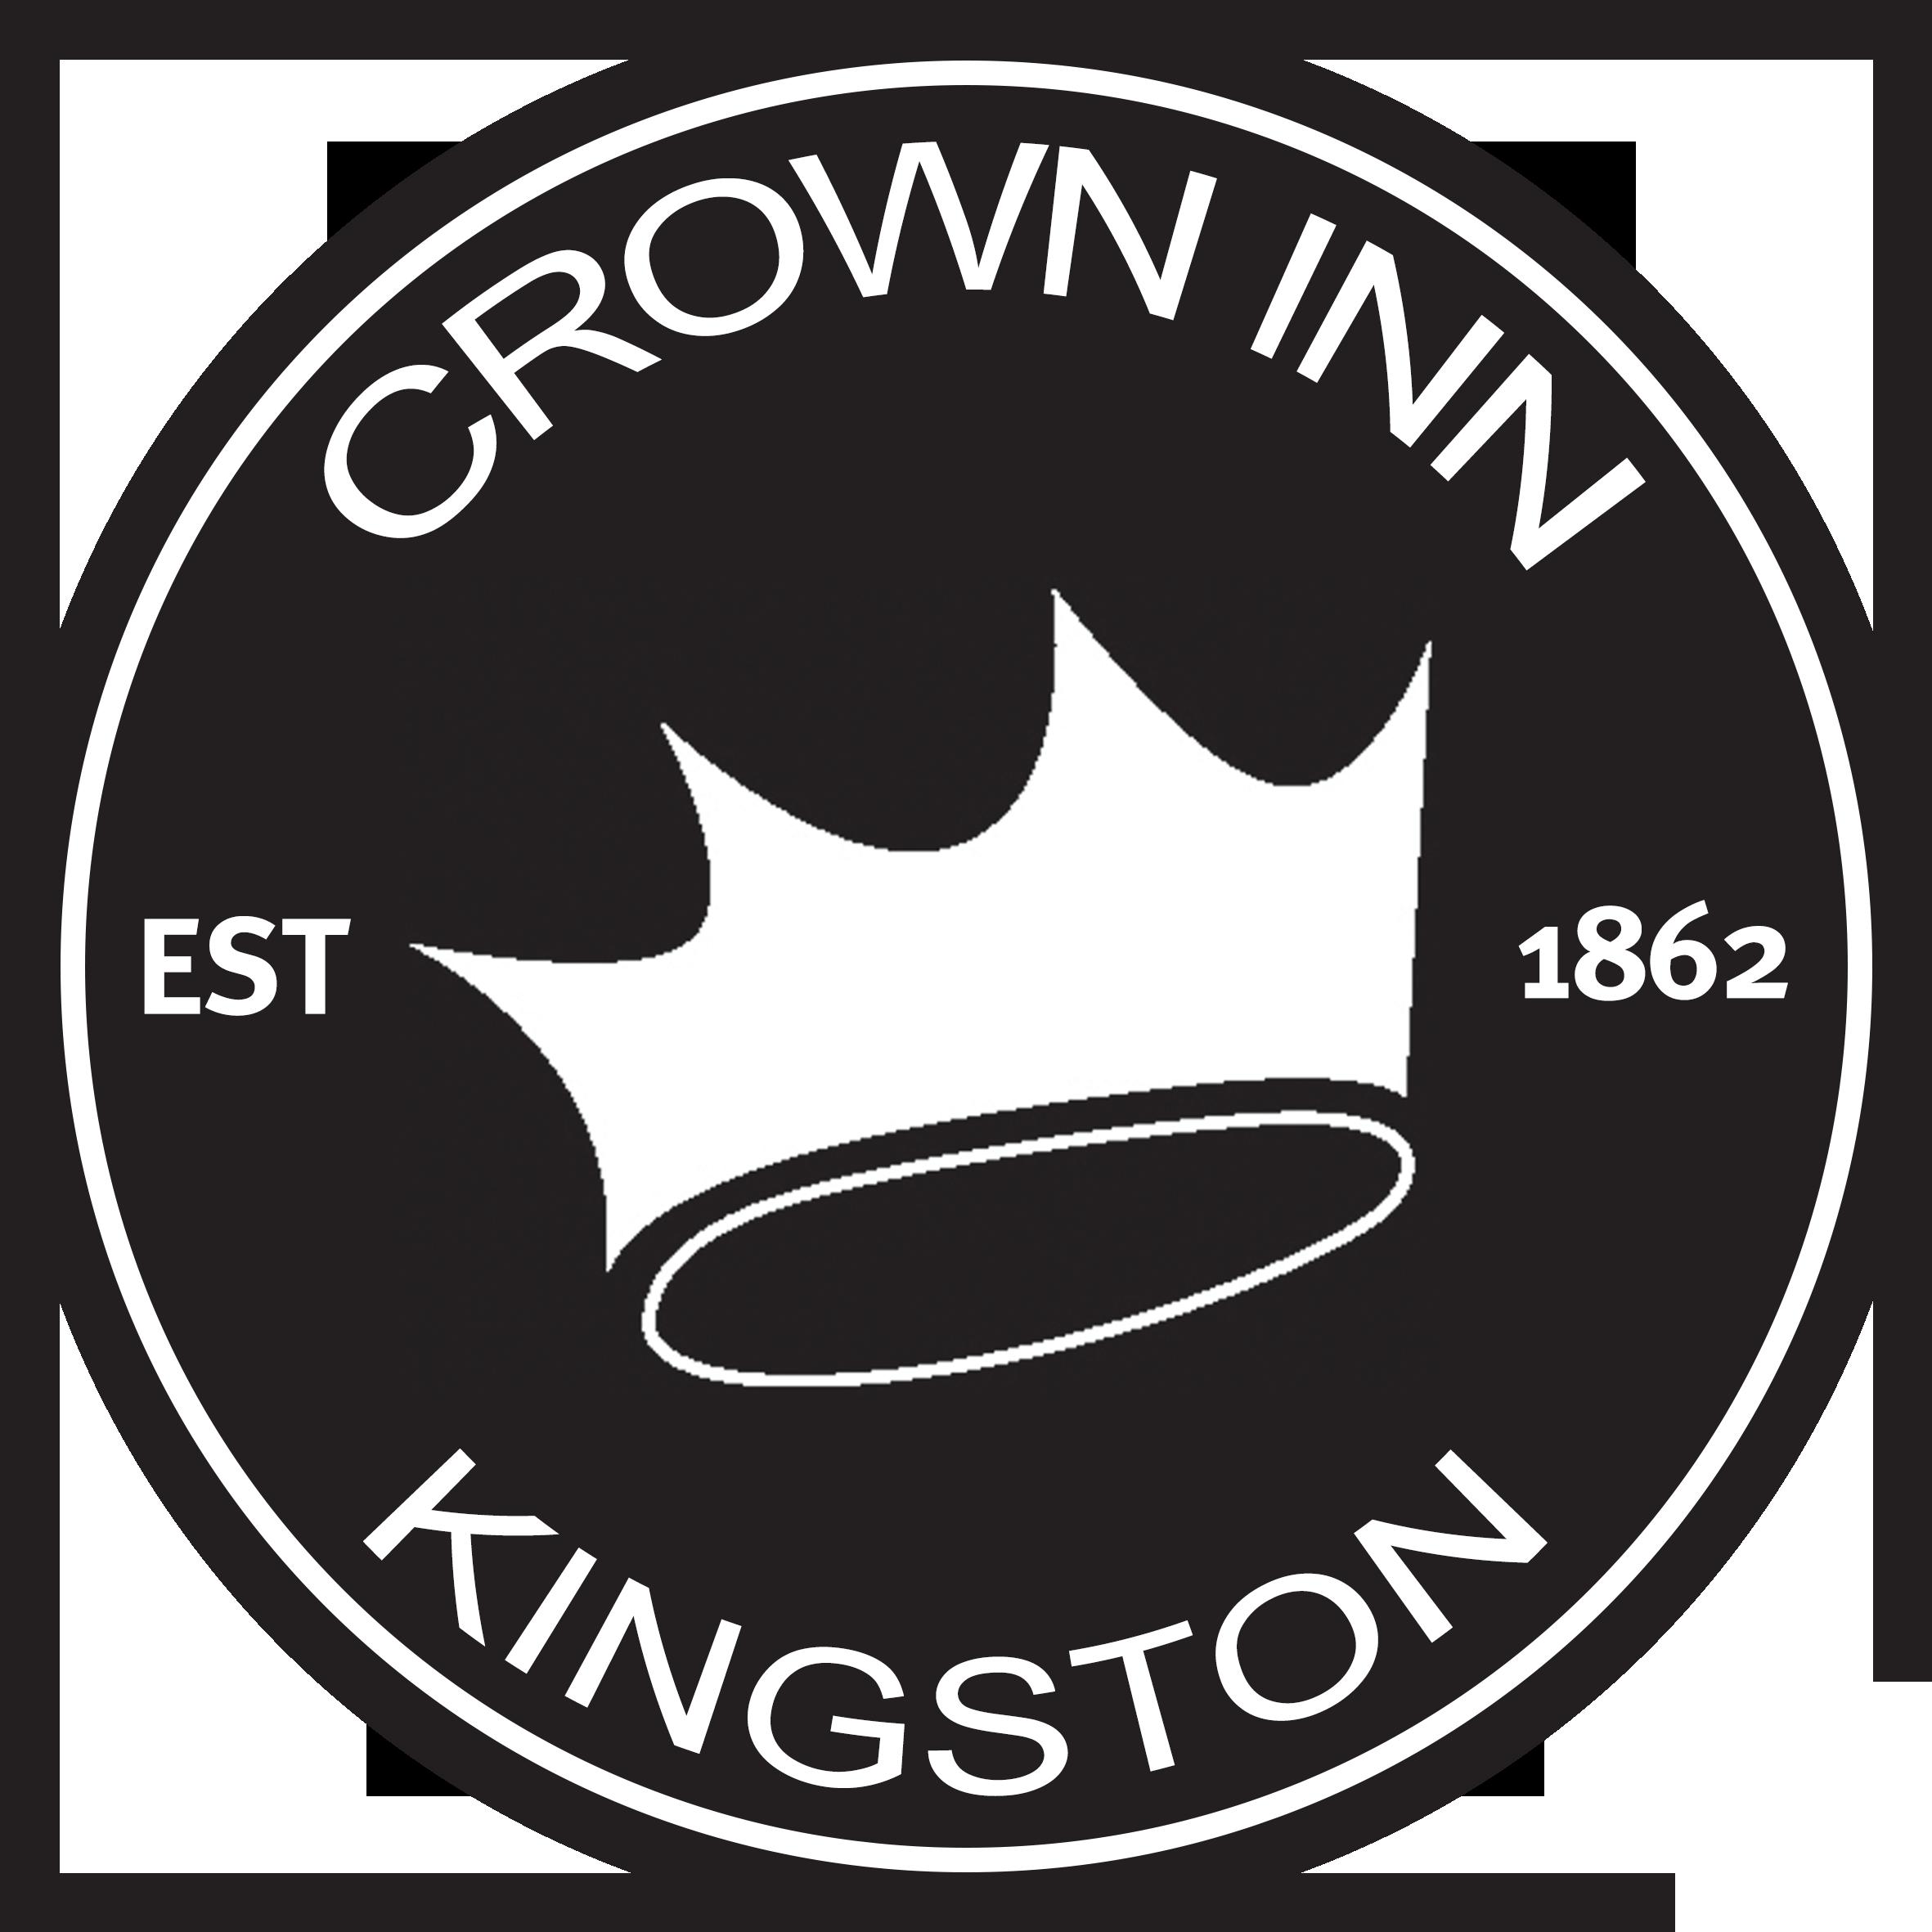 Crown Inn Kingston Logo